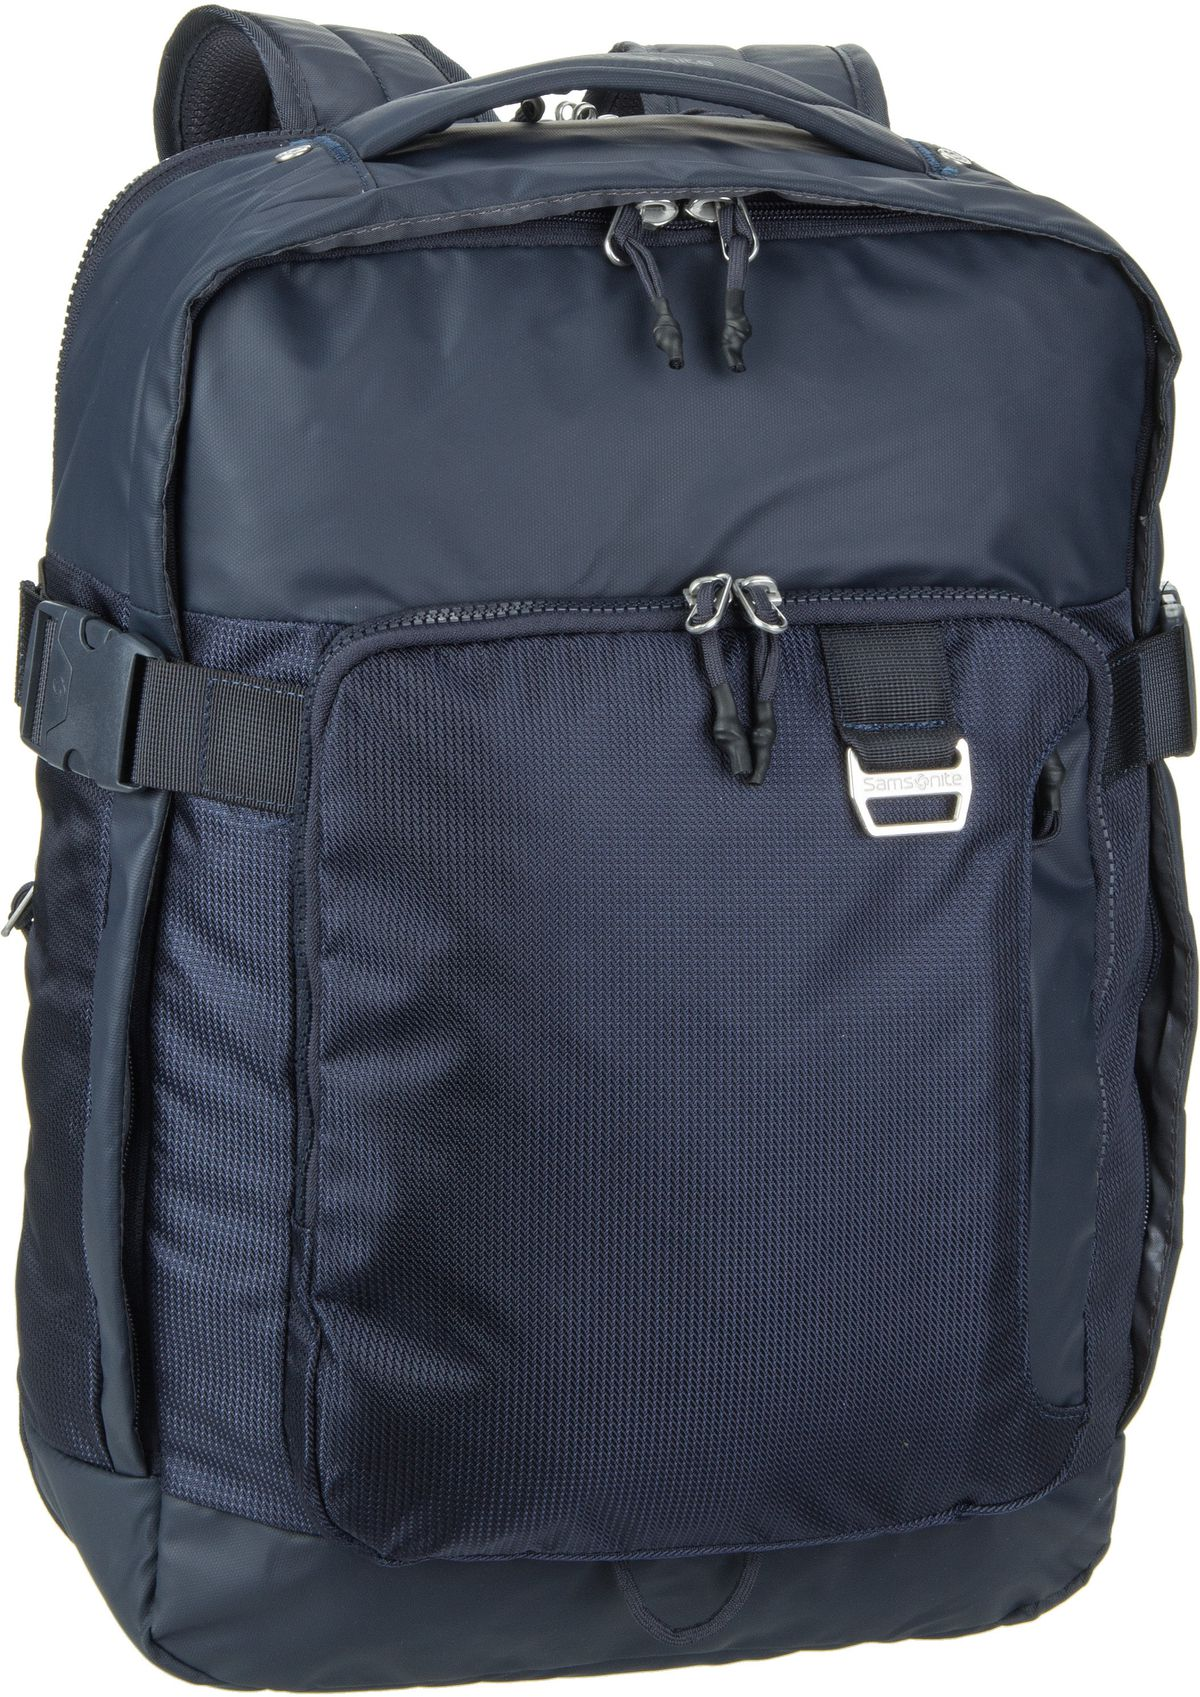 Laptoprucksack Midtown Laptop Backpack L exp Dark Blue (29 Liter)